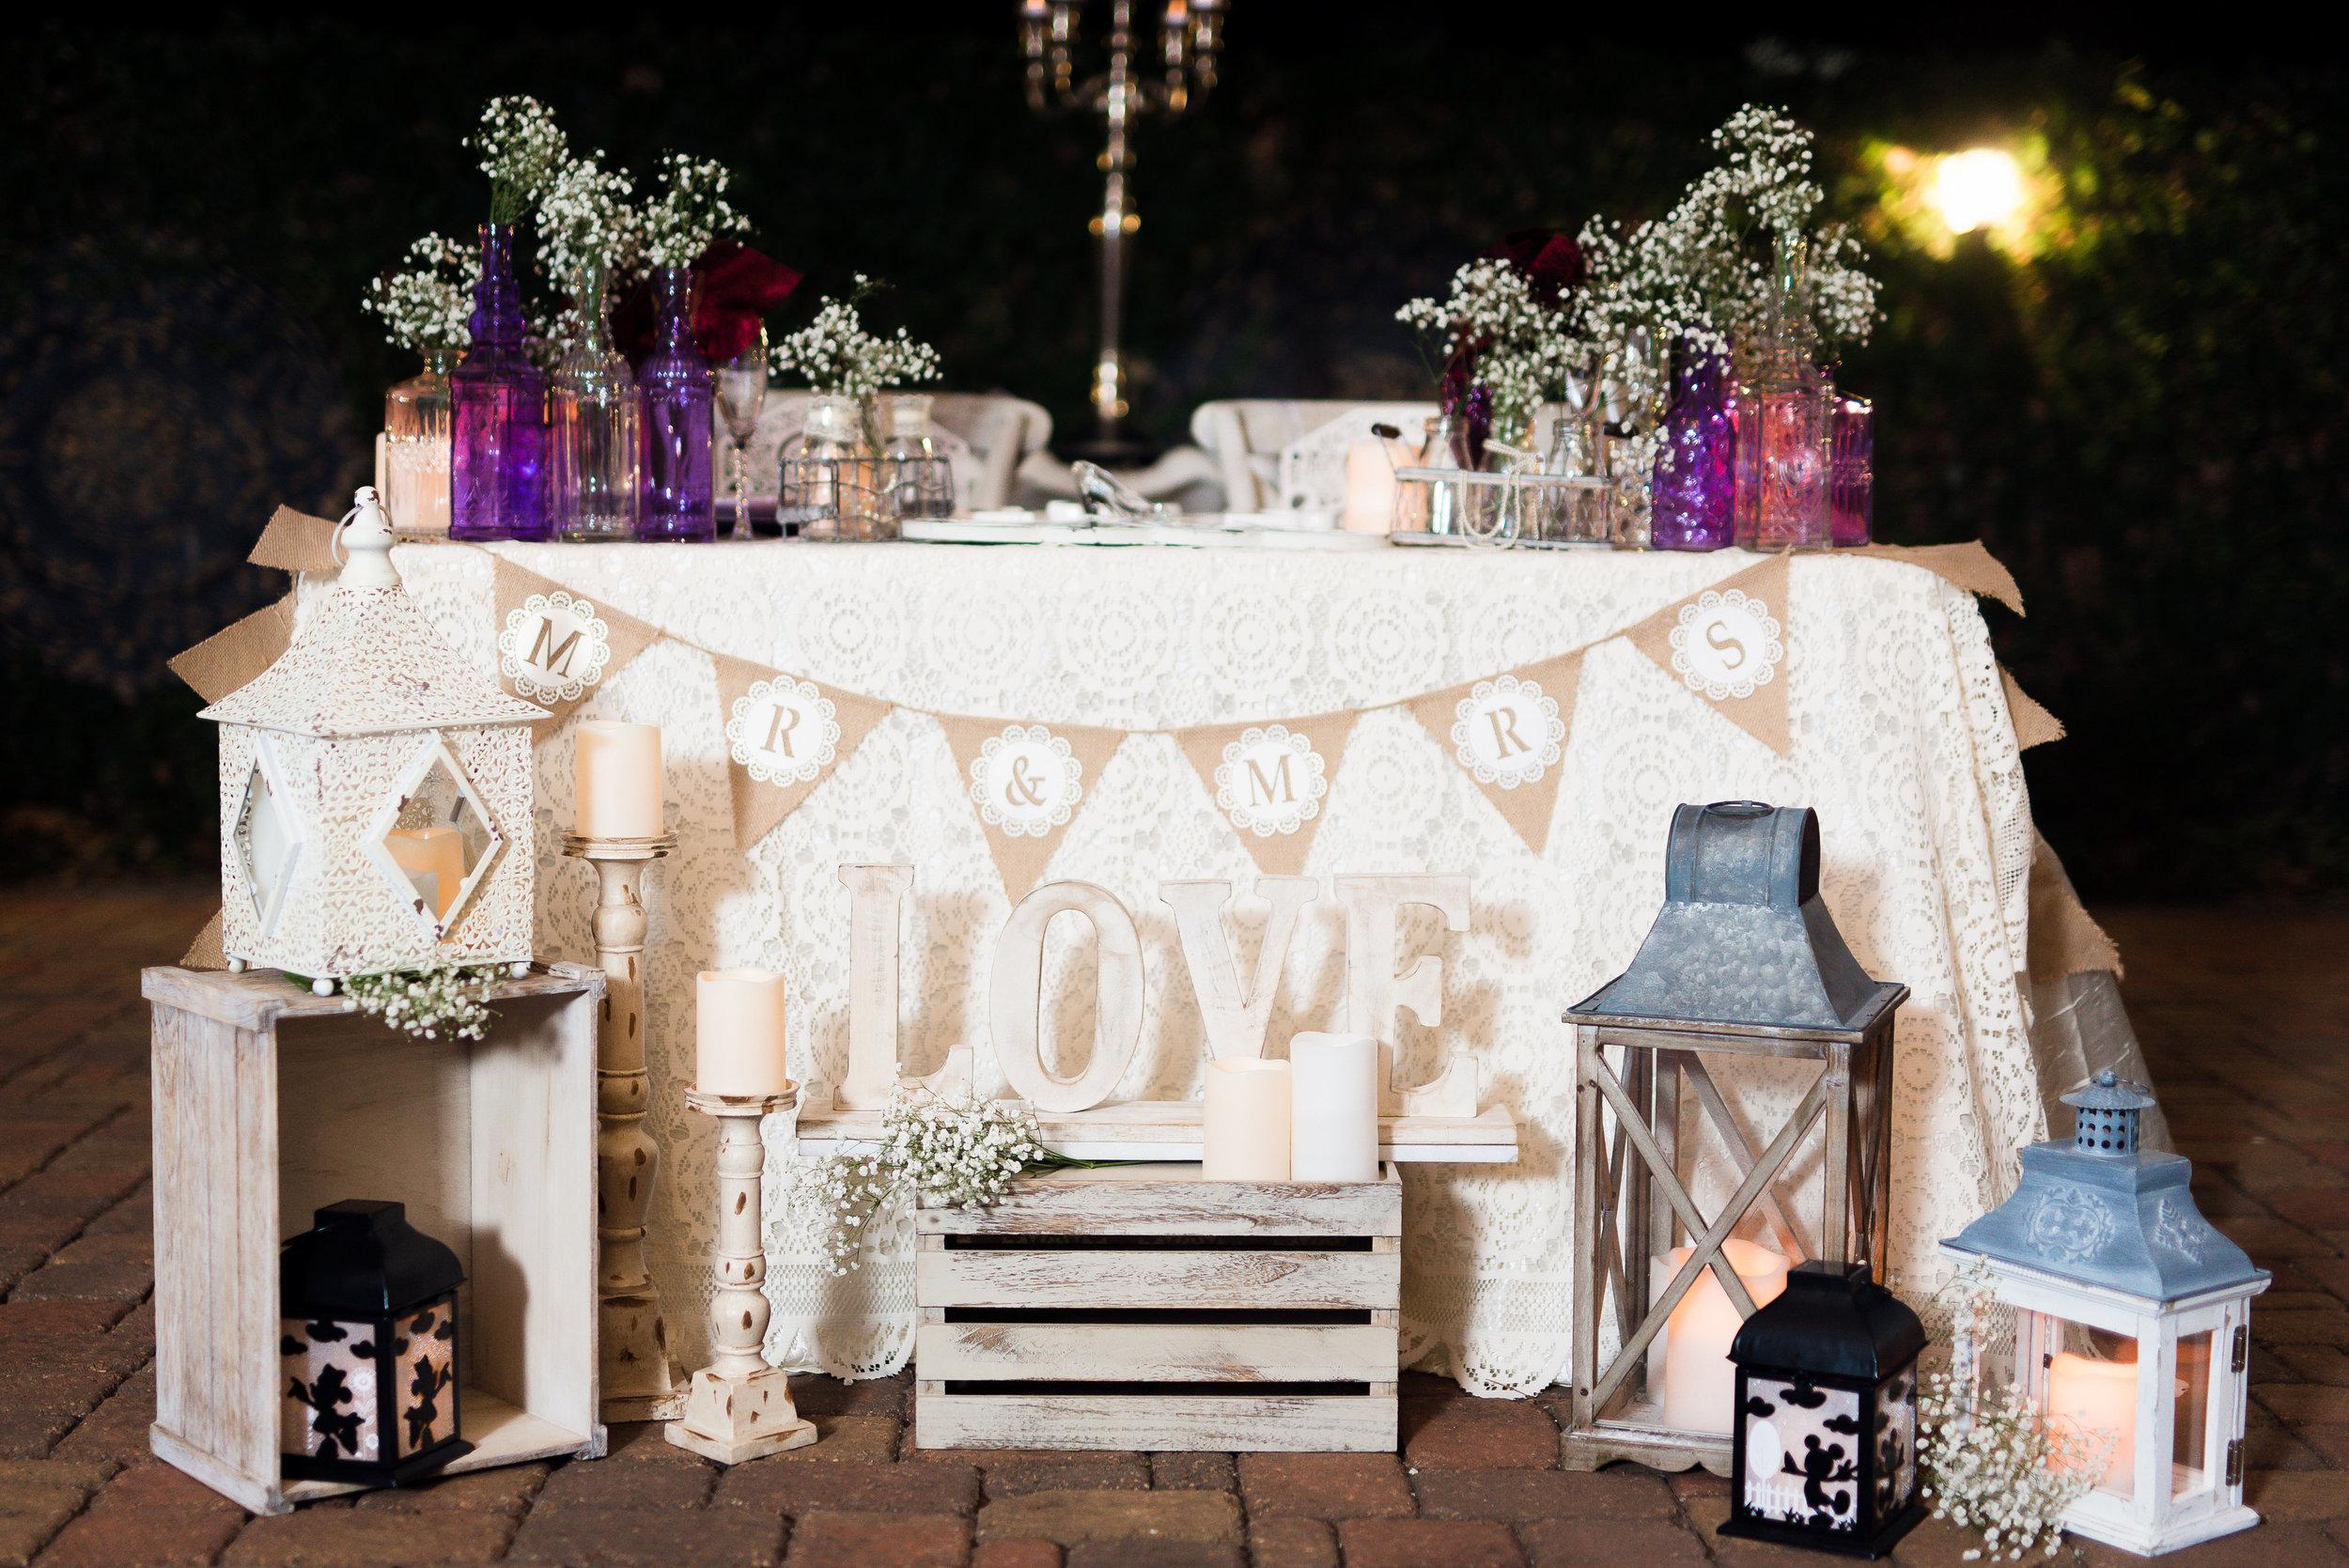 TC-Jessica-Garr-Pharris-Photography-Real-Wedding-38.jpg